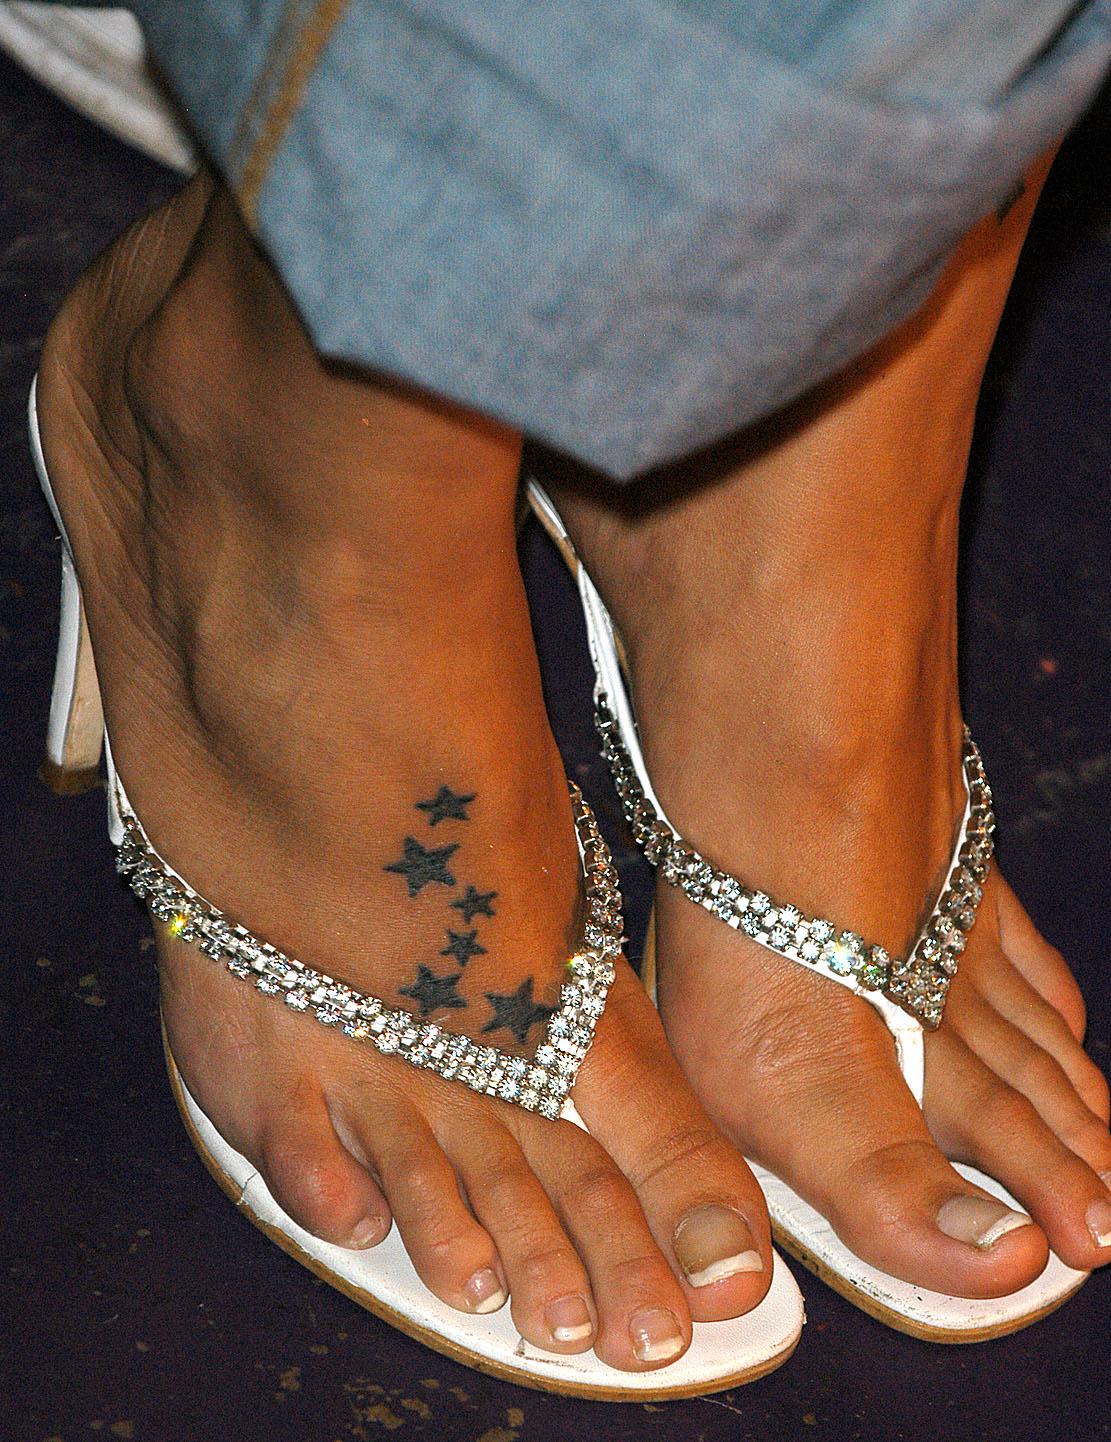 http://1.bp.blogspot.com/_UaLWp72nij4/S-HKU0NKZxI/AAAAAAAAJrg/aONPwIXQ0JU/s1600/jodie-marsh-feet.jpg